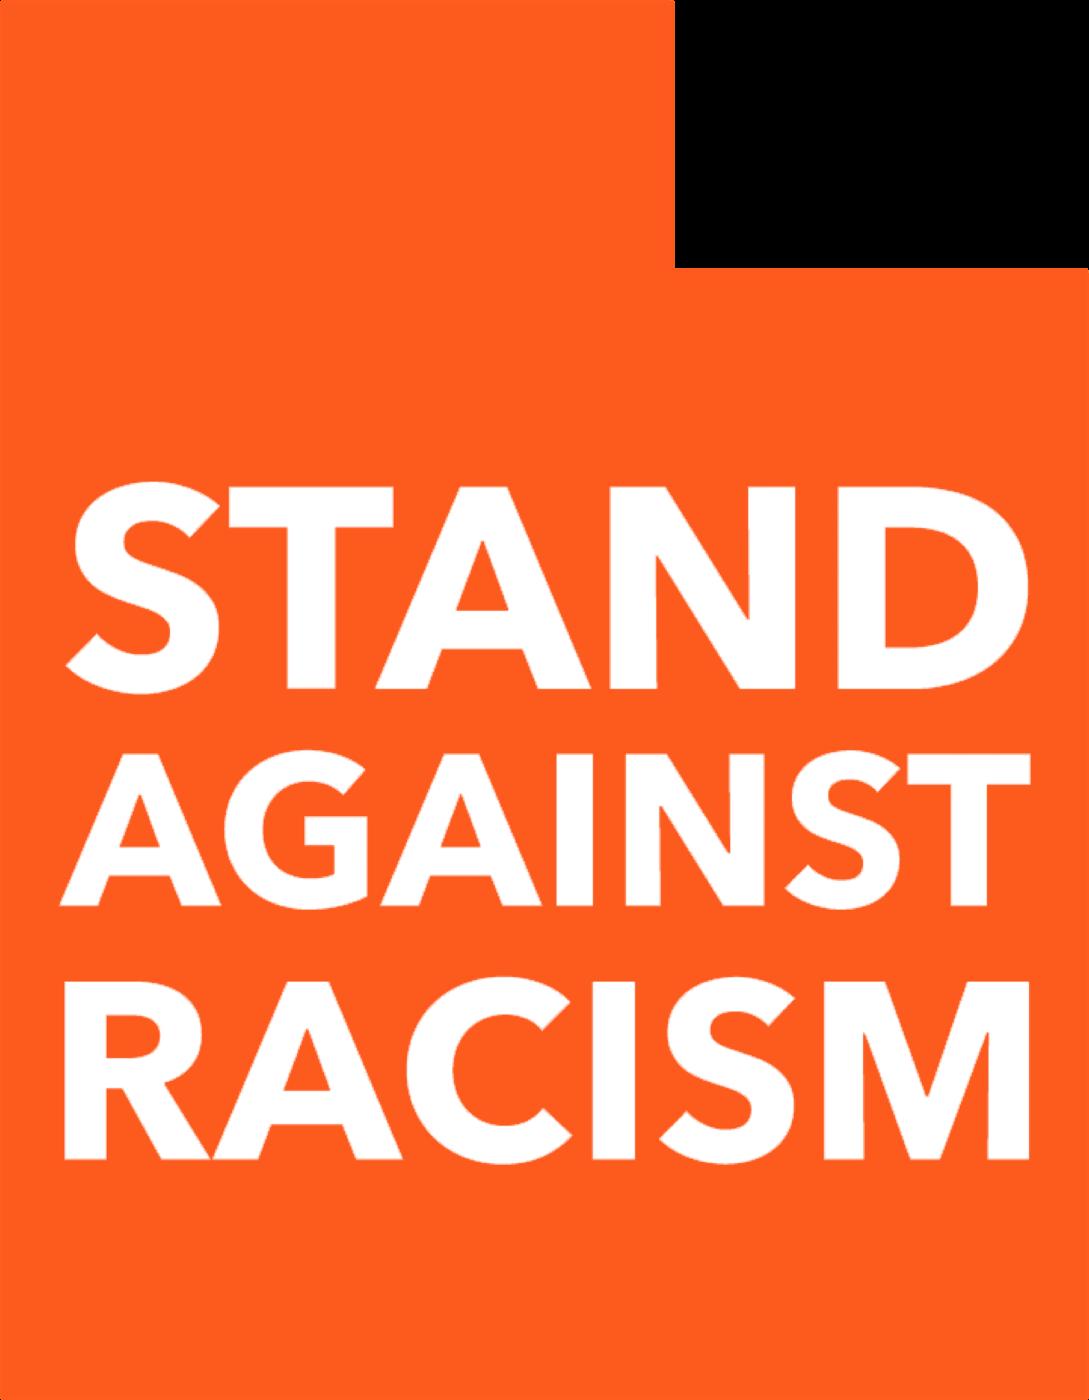 Stand Against Racism Utah